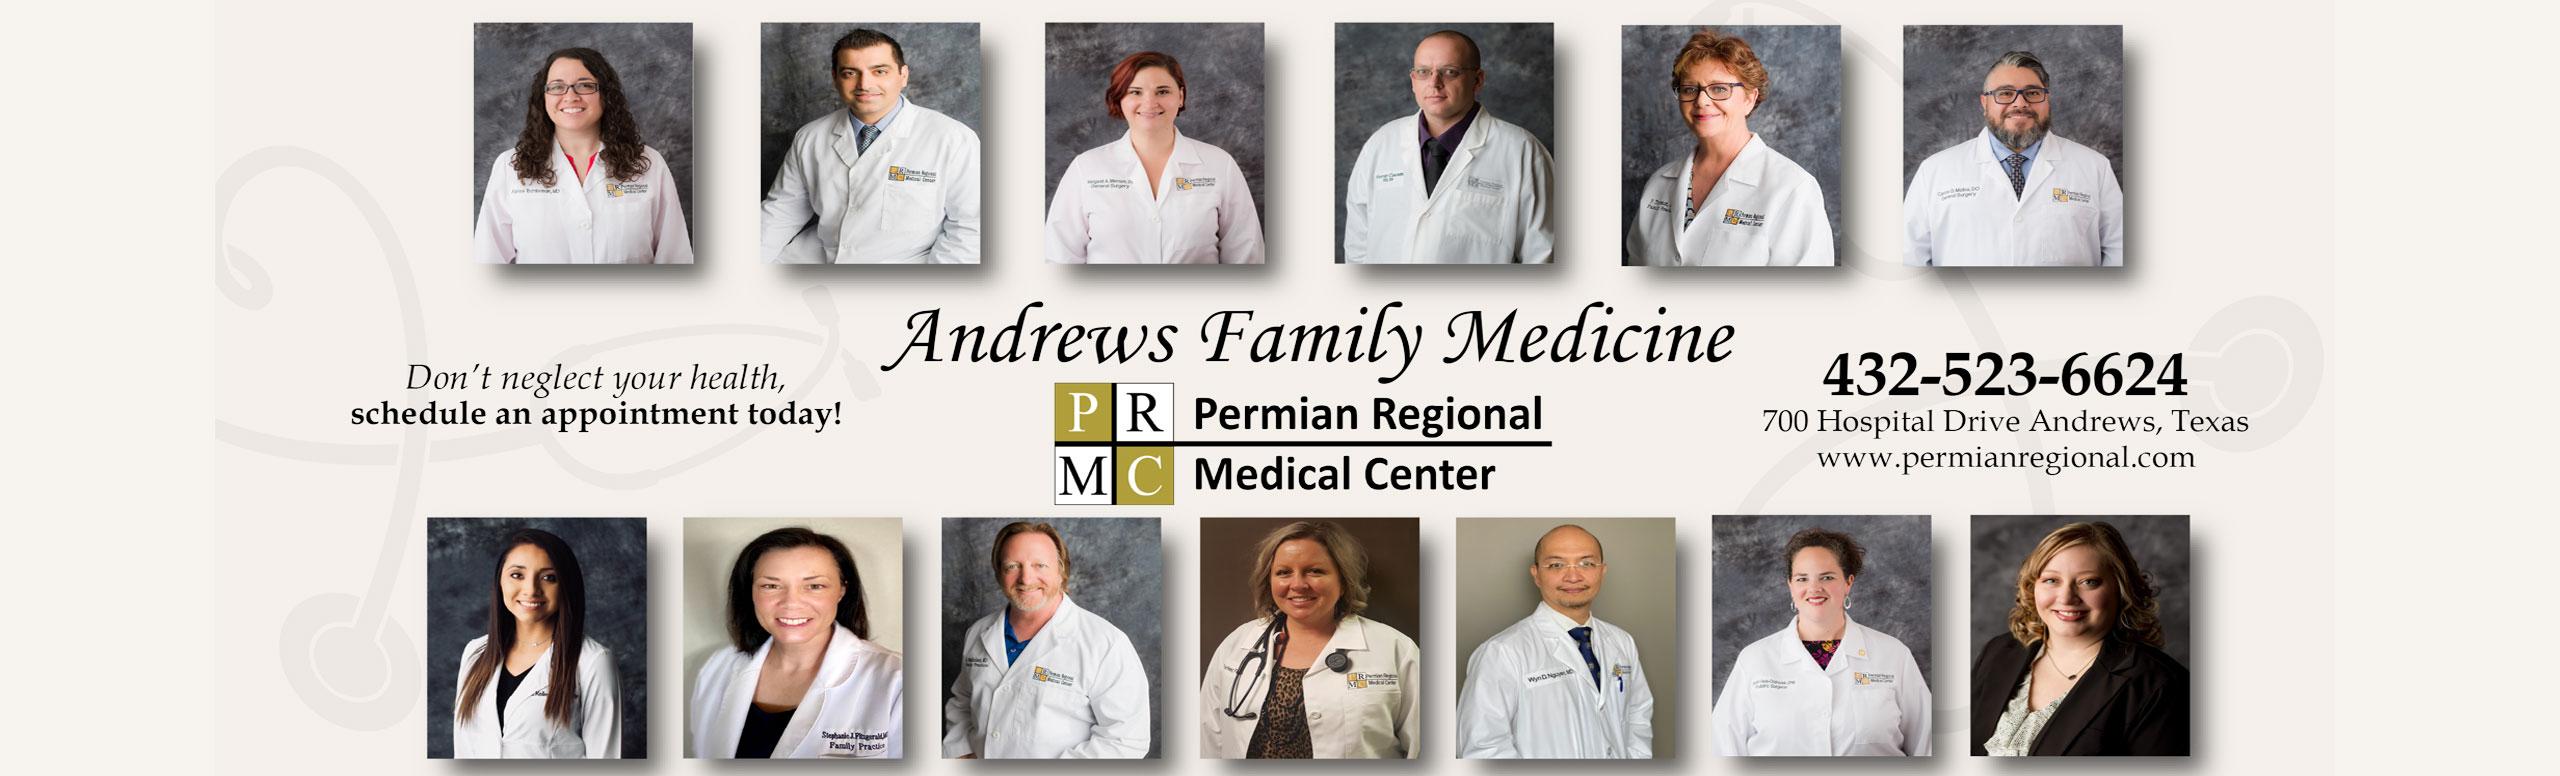 Andrews Family Medicine